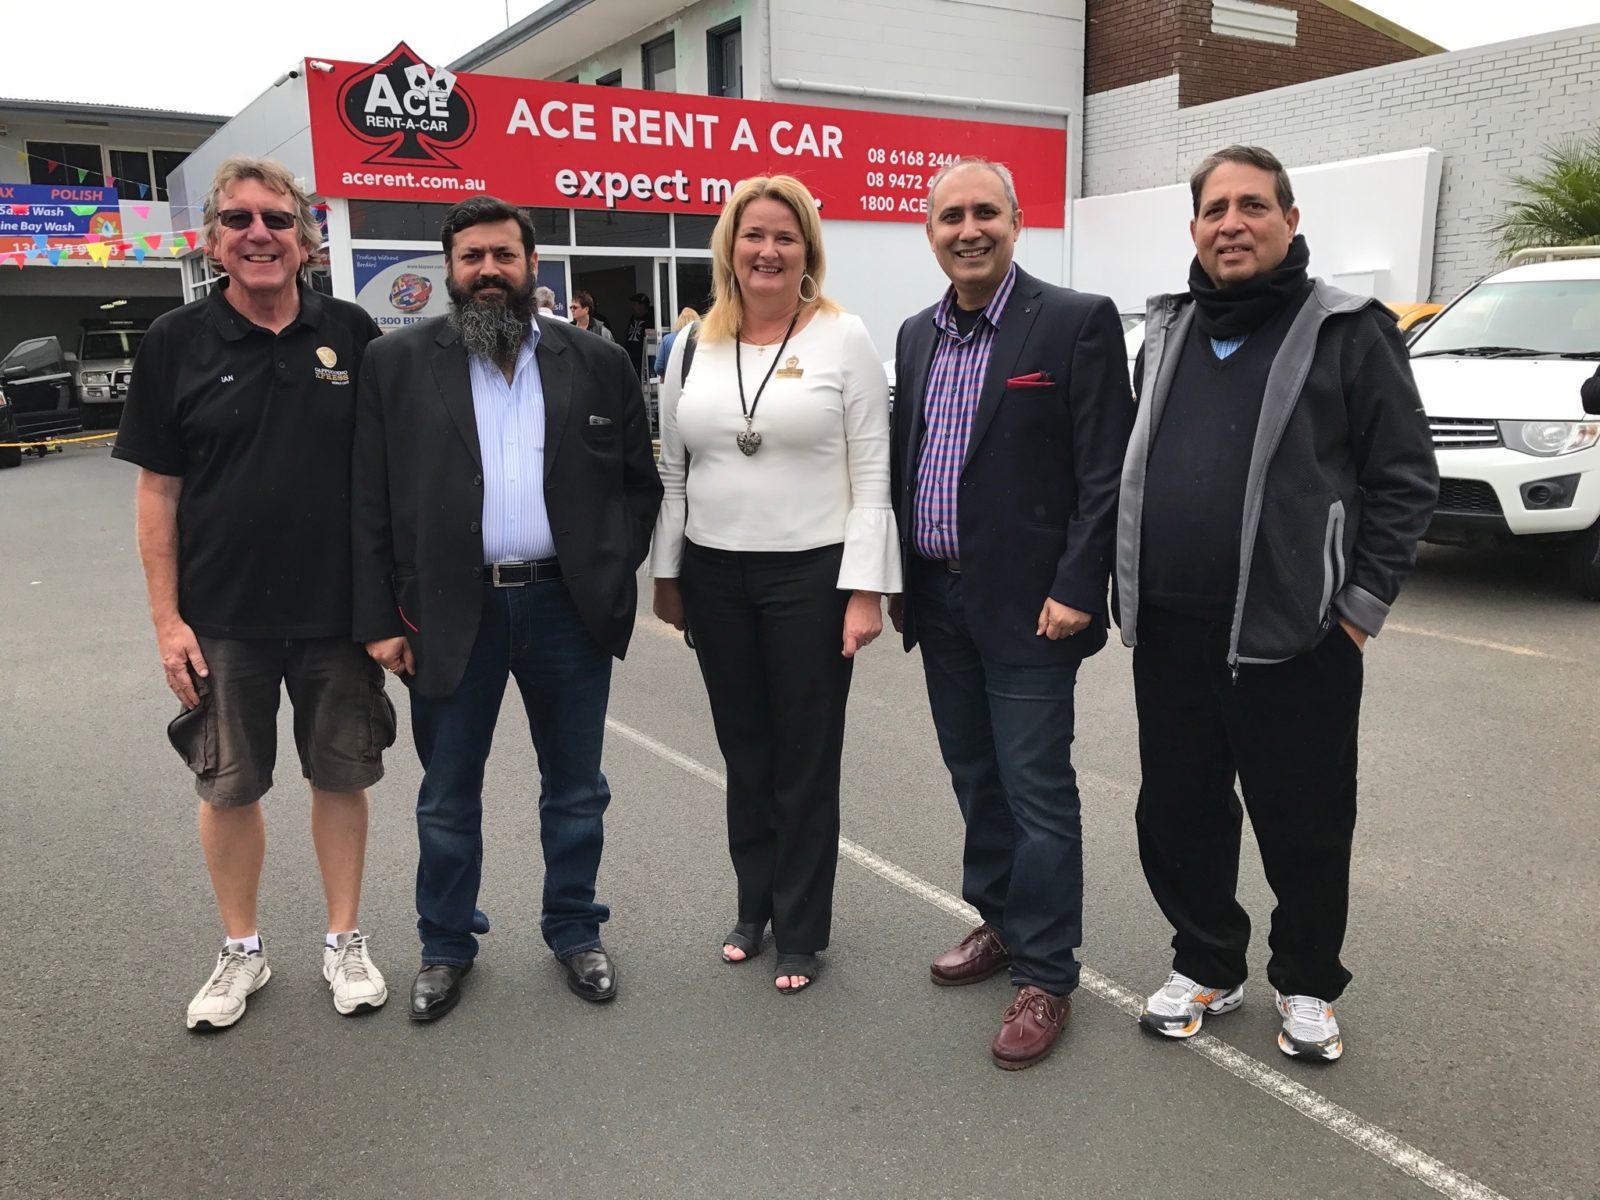 Ace Rent A Car, Mandurah, Western Australia